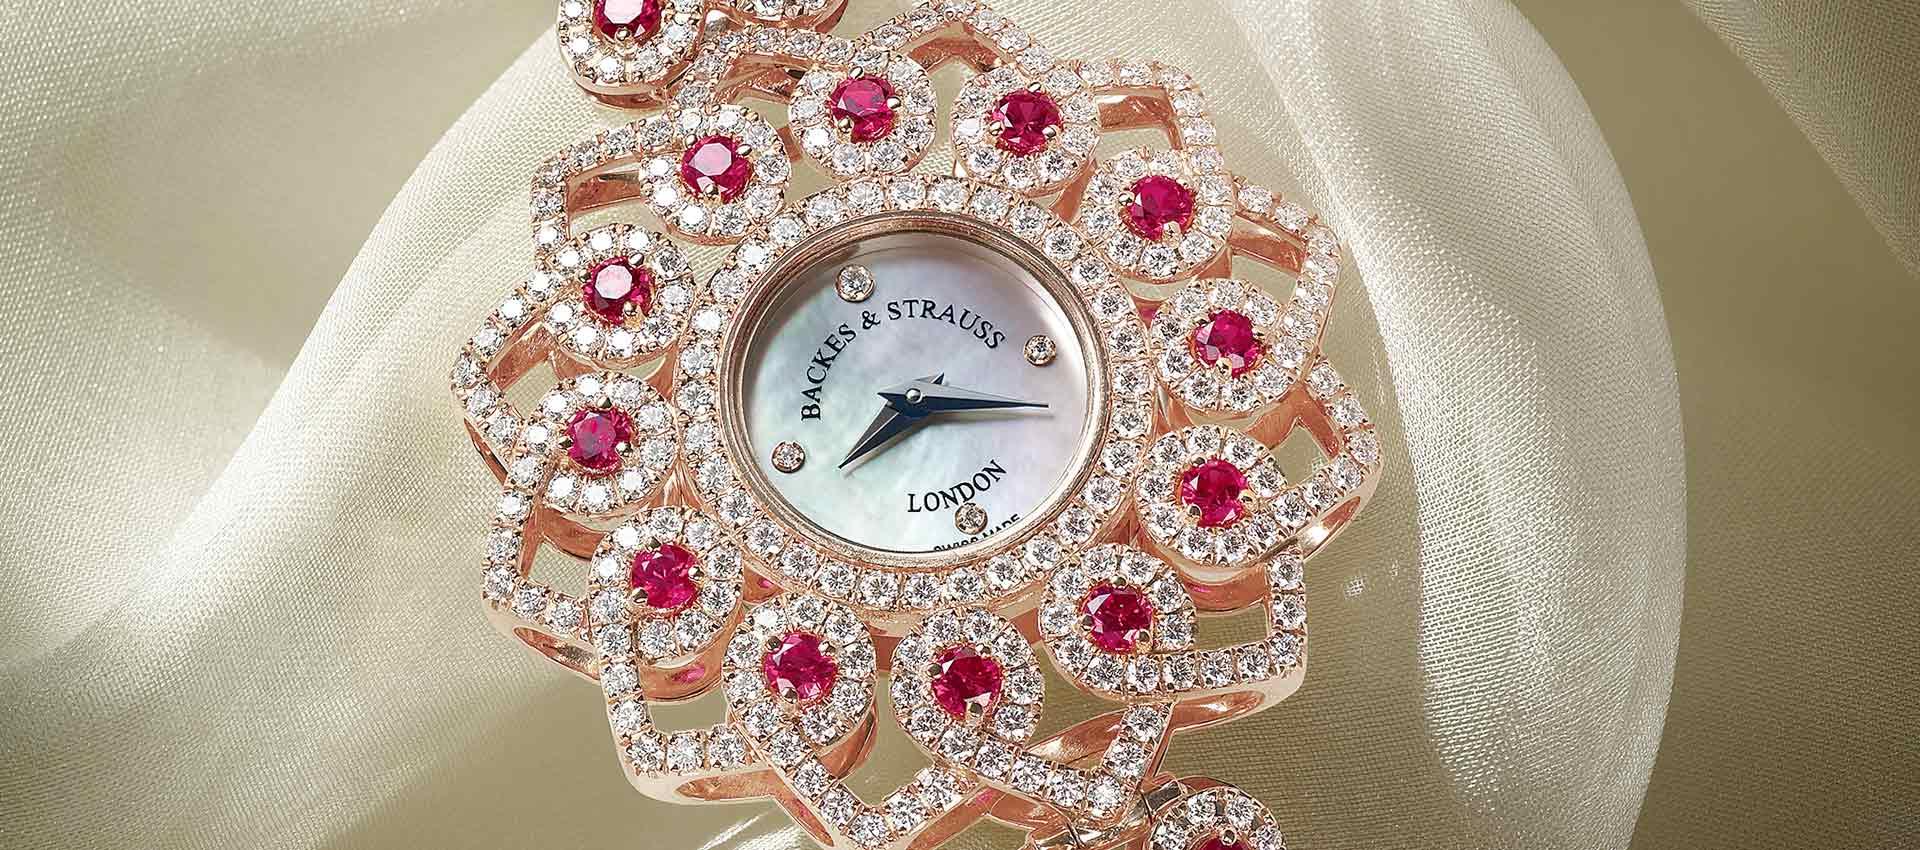 Princess Victoria diamond wristwatch for ladies